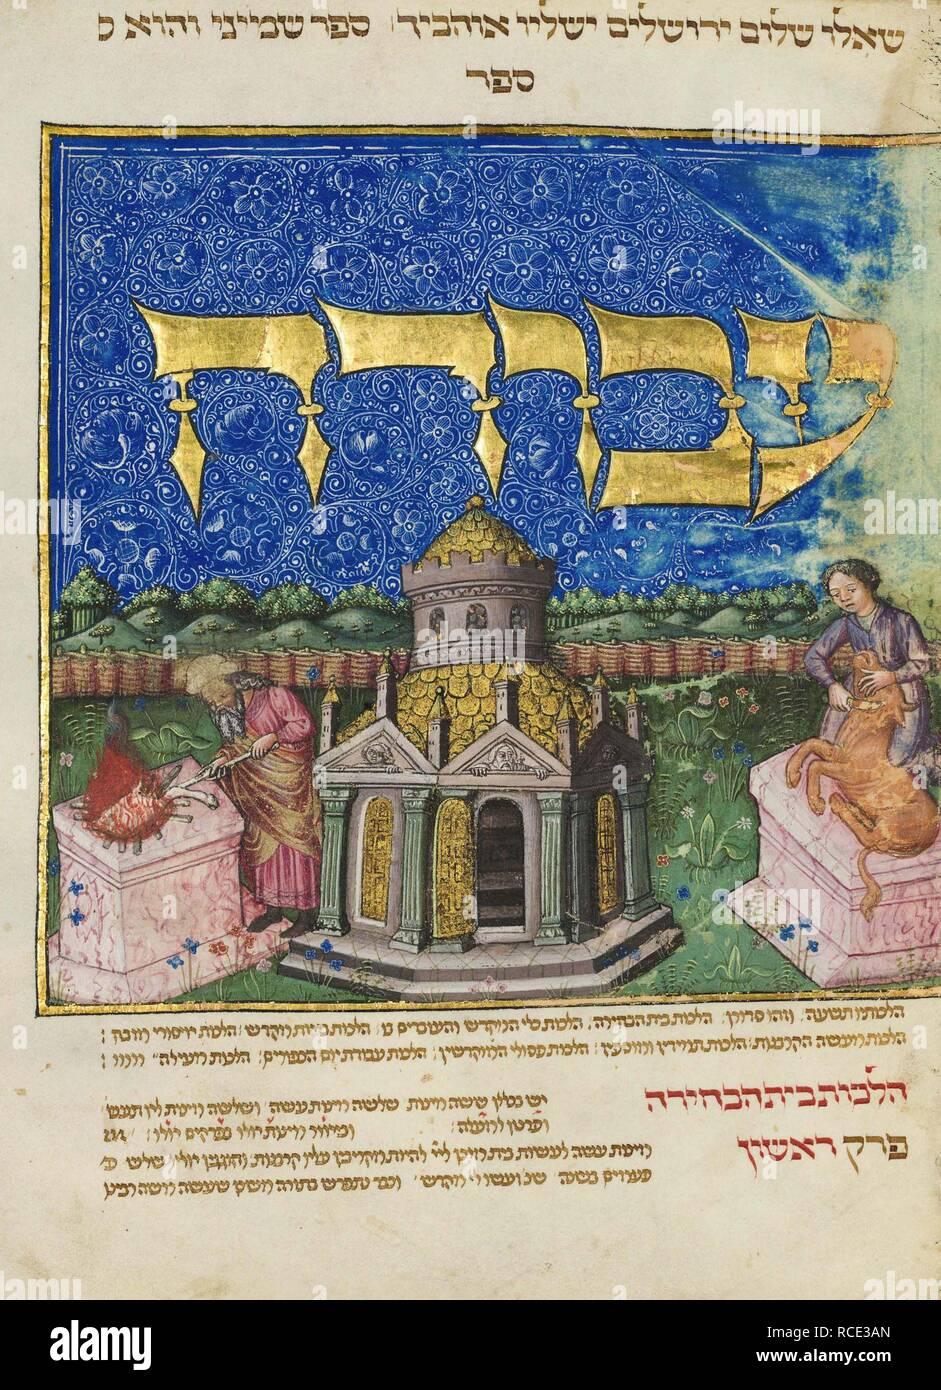 The Mishneh Torah (Repetition of the Torah). Museum: Israel Museum, Jerusalem. Author: ANONYMOUS. - Stock Image